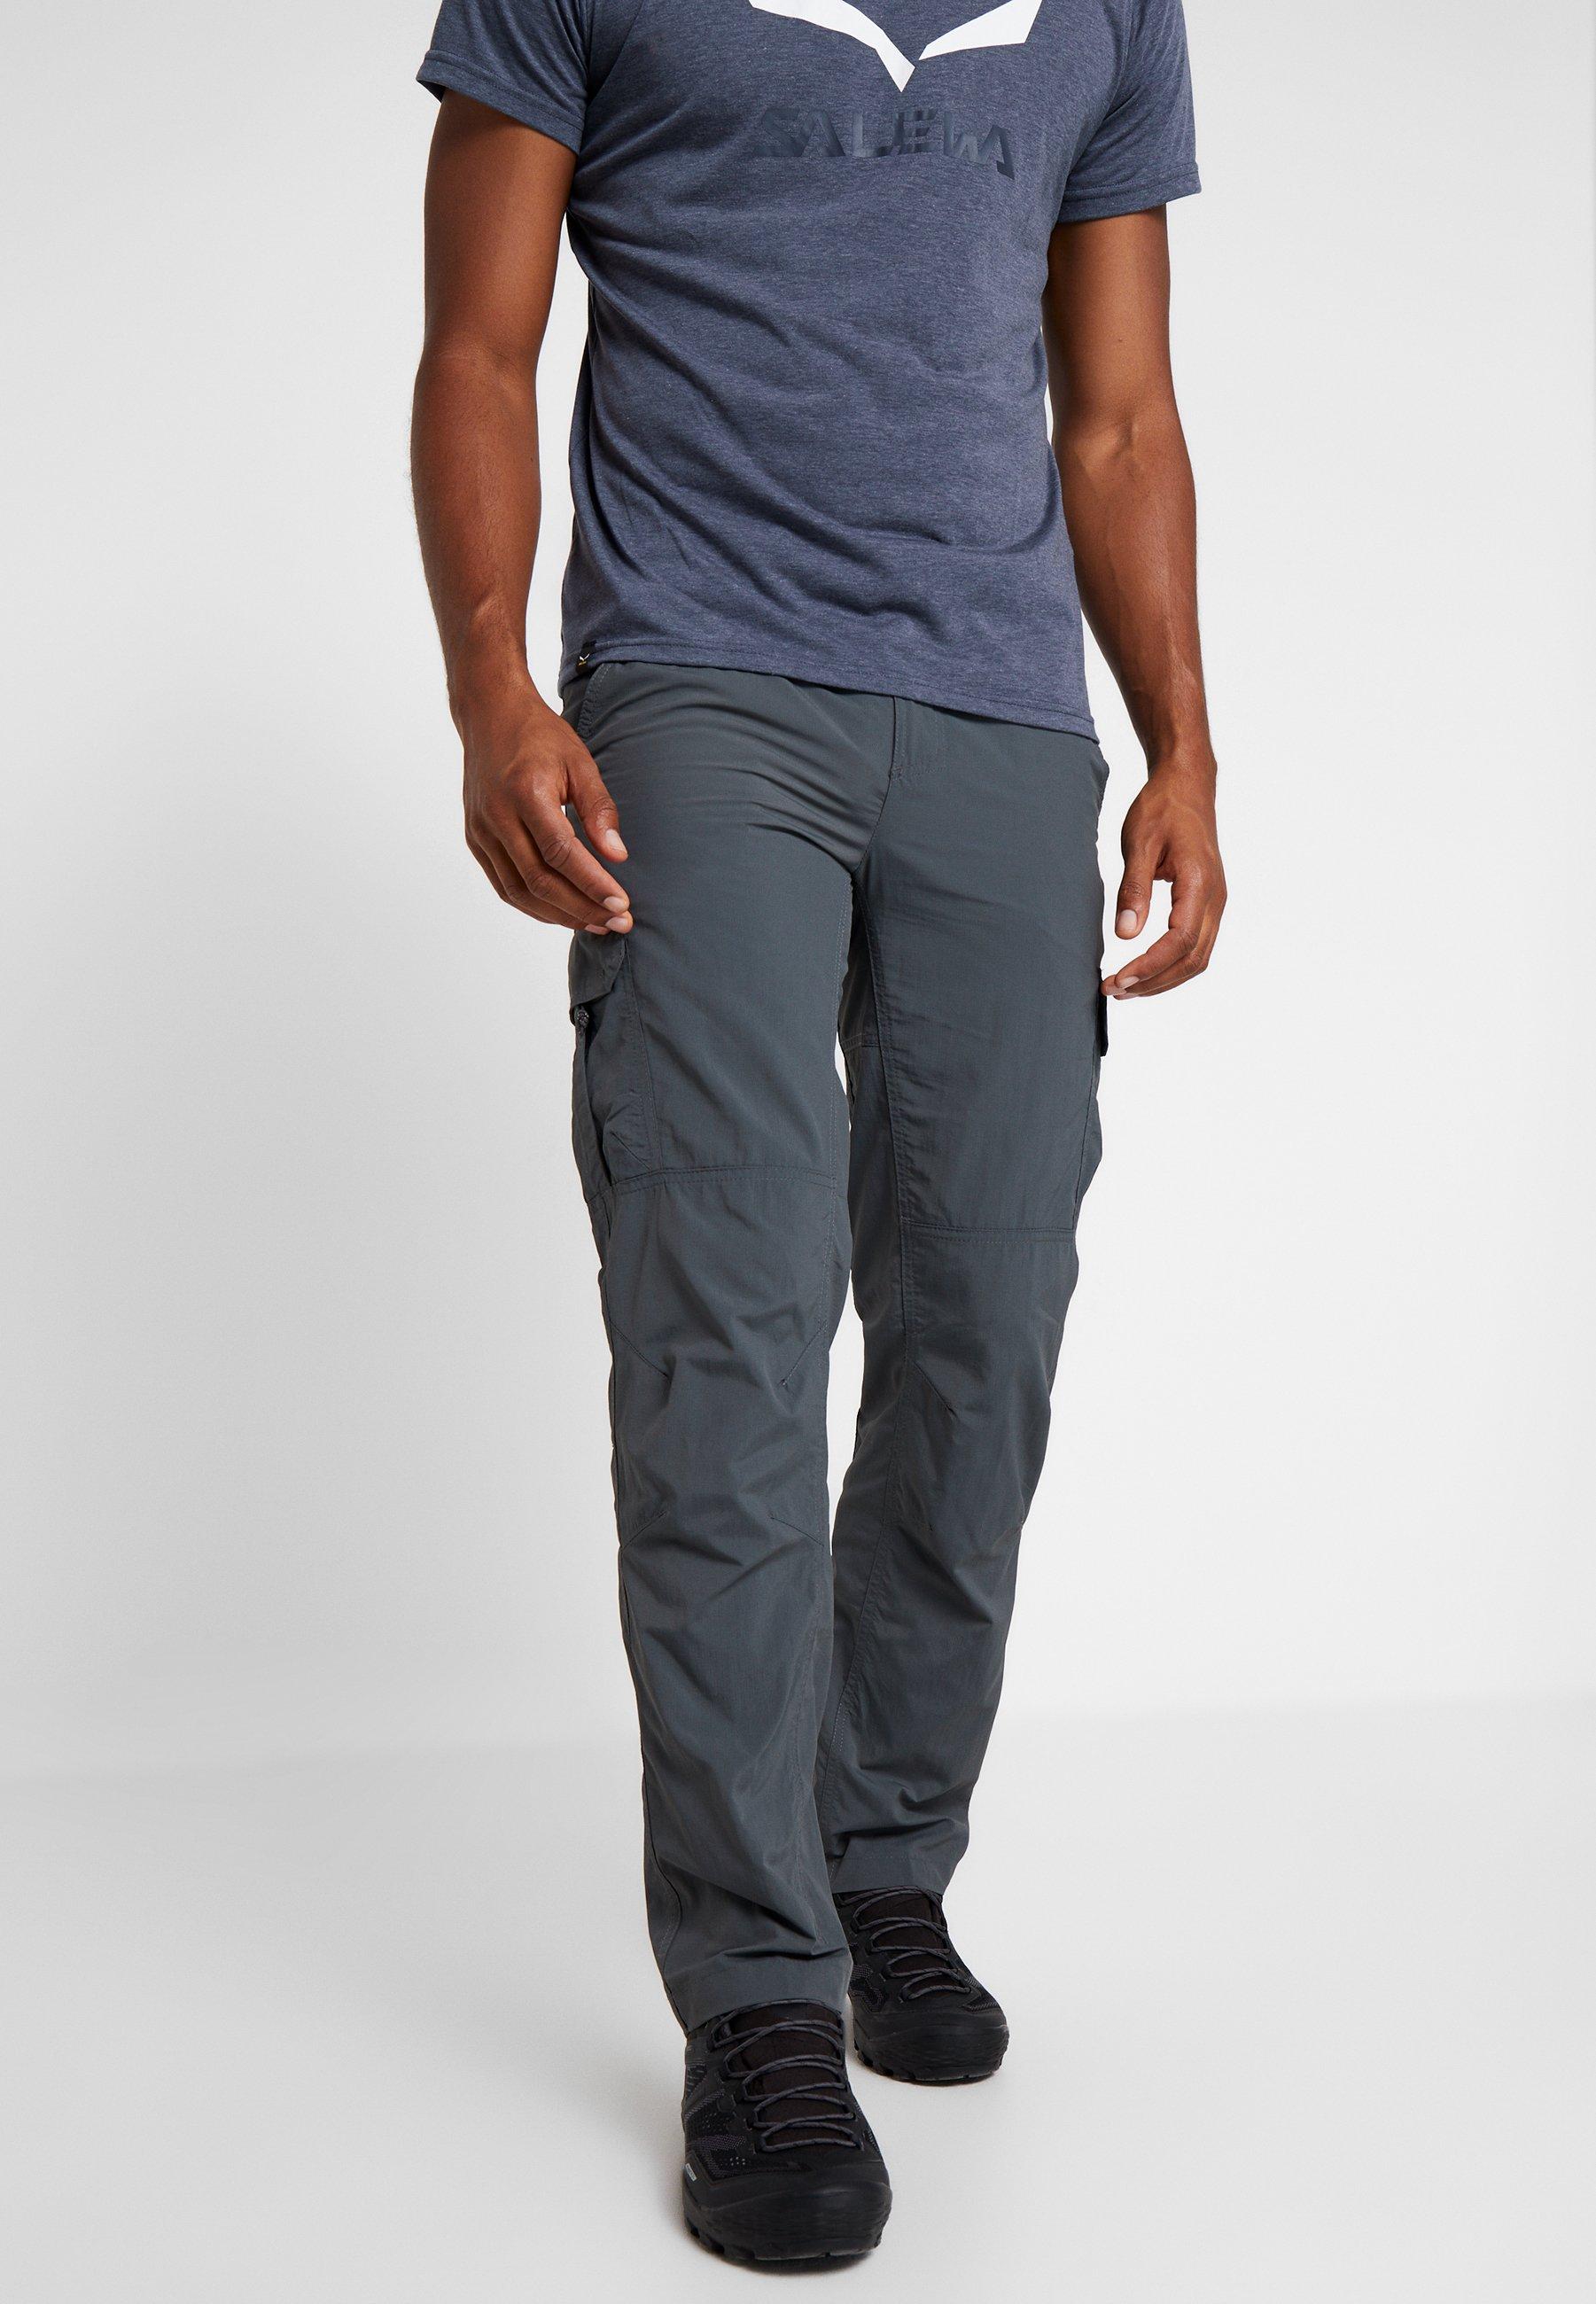 Homme SILVER RIDGE CARGO PANT - Pantalons outdoor